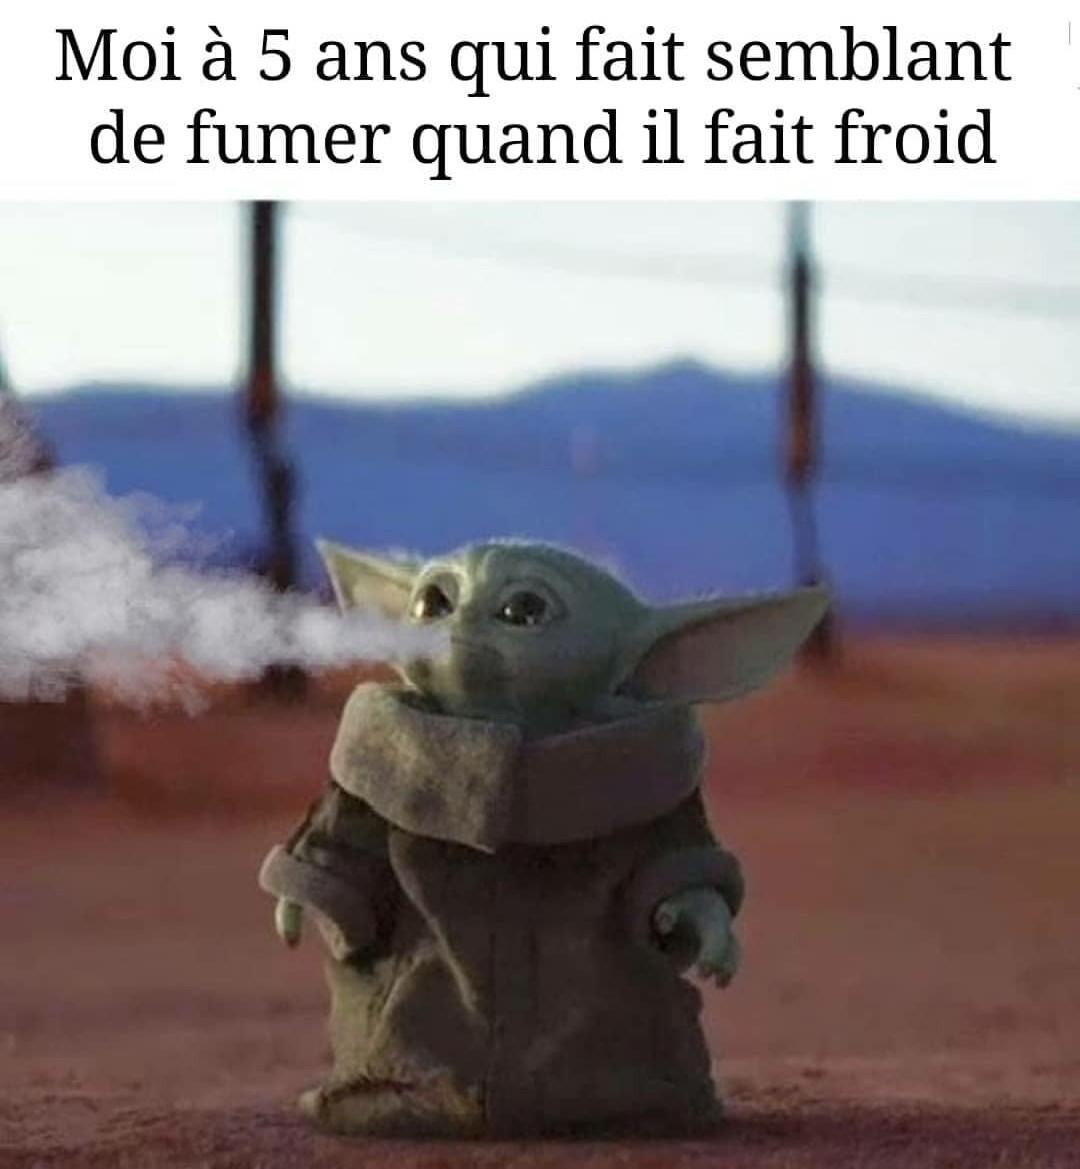 Fumer tue les enfants - meme